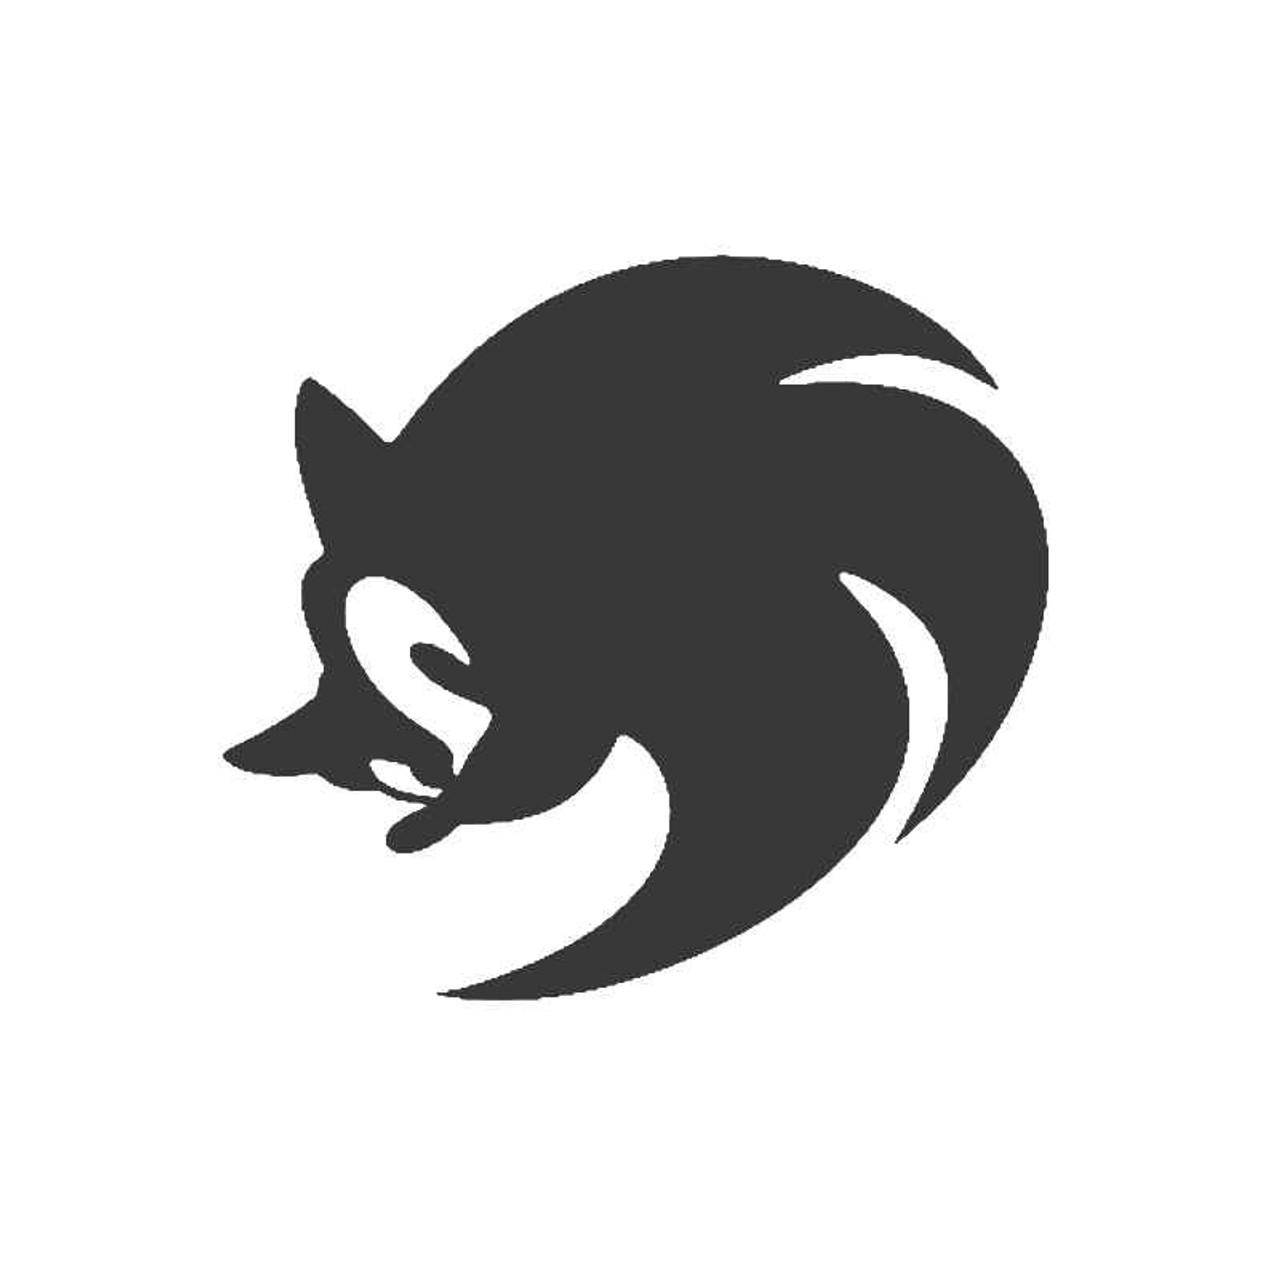 Sonic Hedgehog Modern Sega Nintendo Wii 3ds Xbox Vinyl Sticker